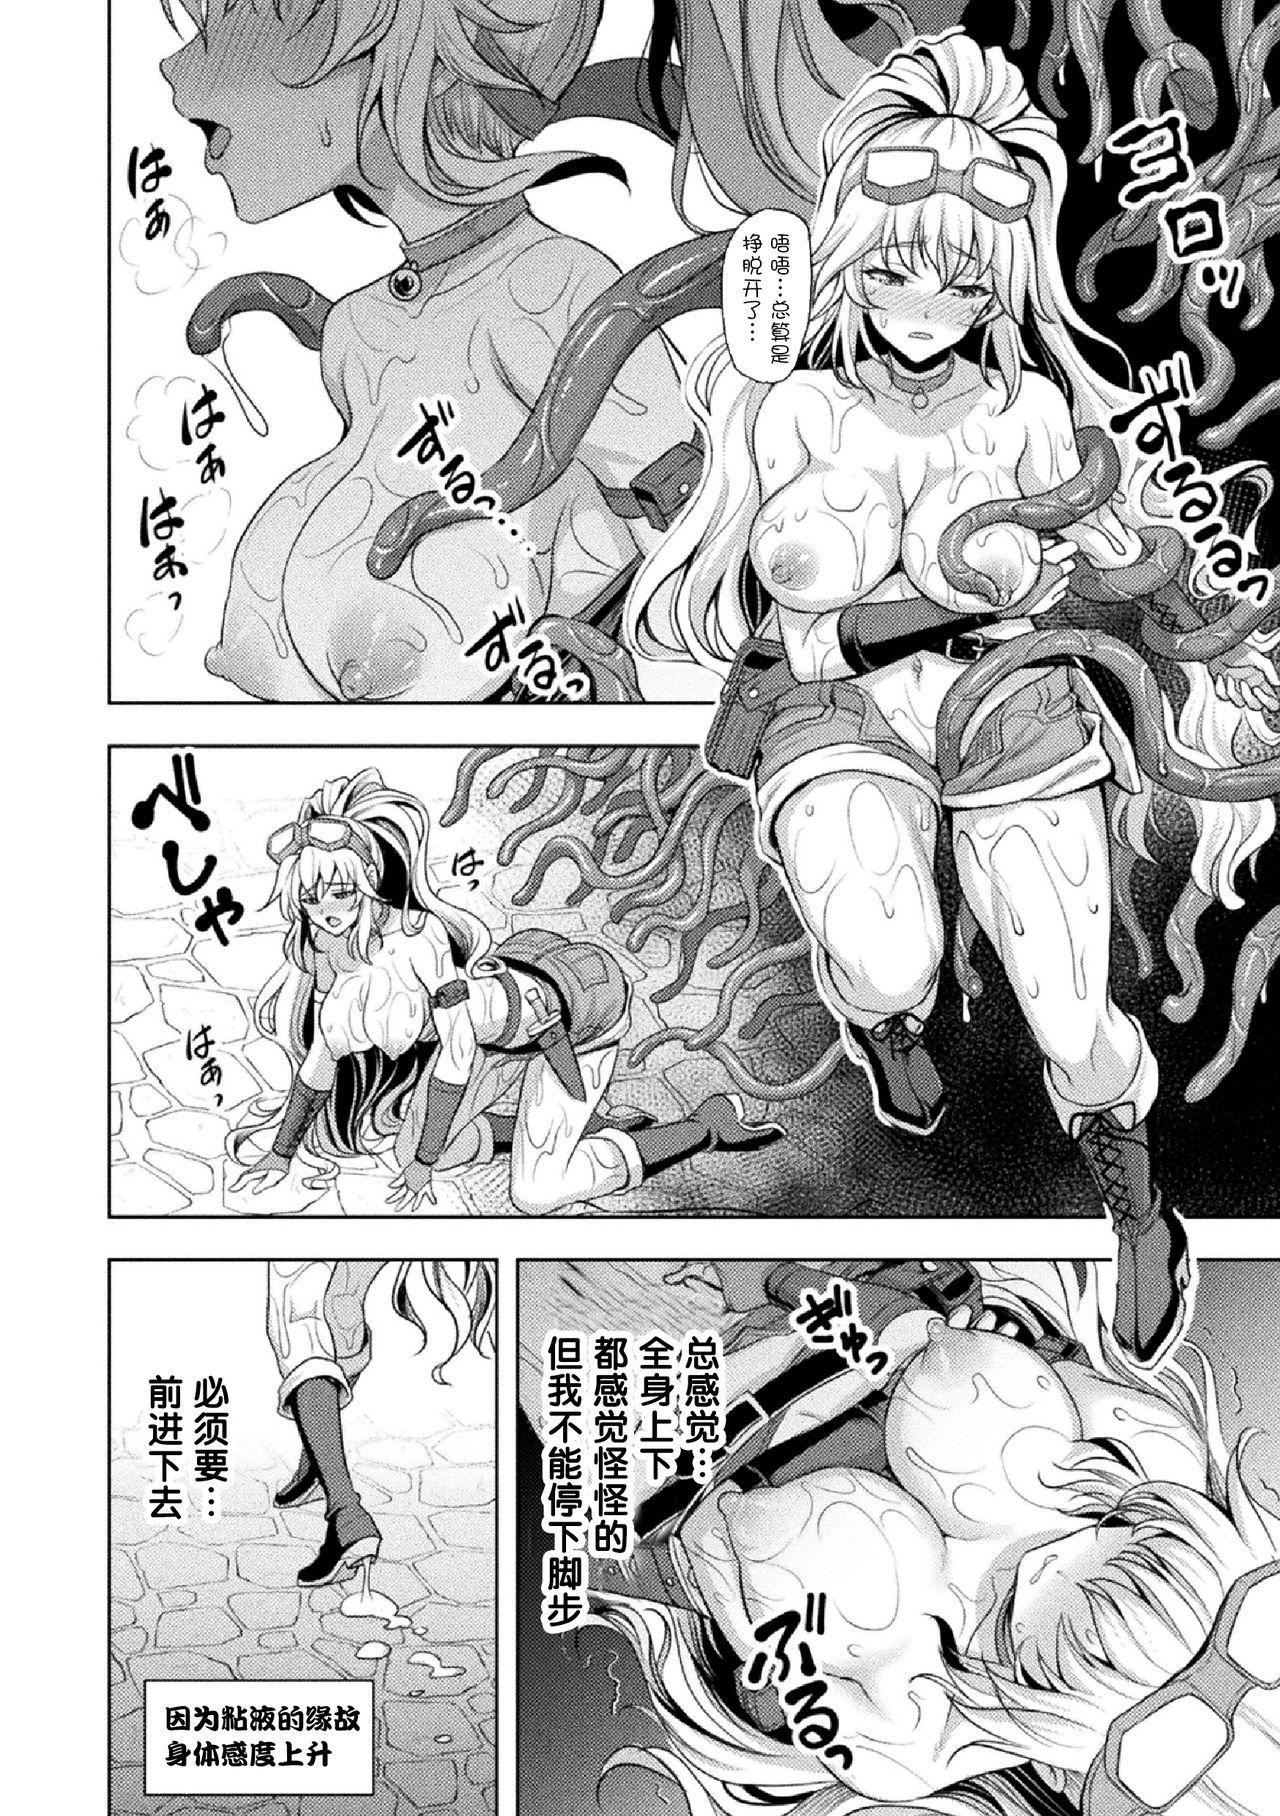 2D Comic Magazine Zecchou Kairaku ga Tomaranai Ero-Trap Dungeon Vol. 2 7